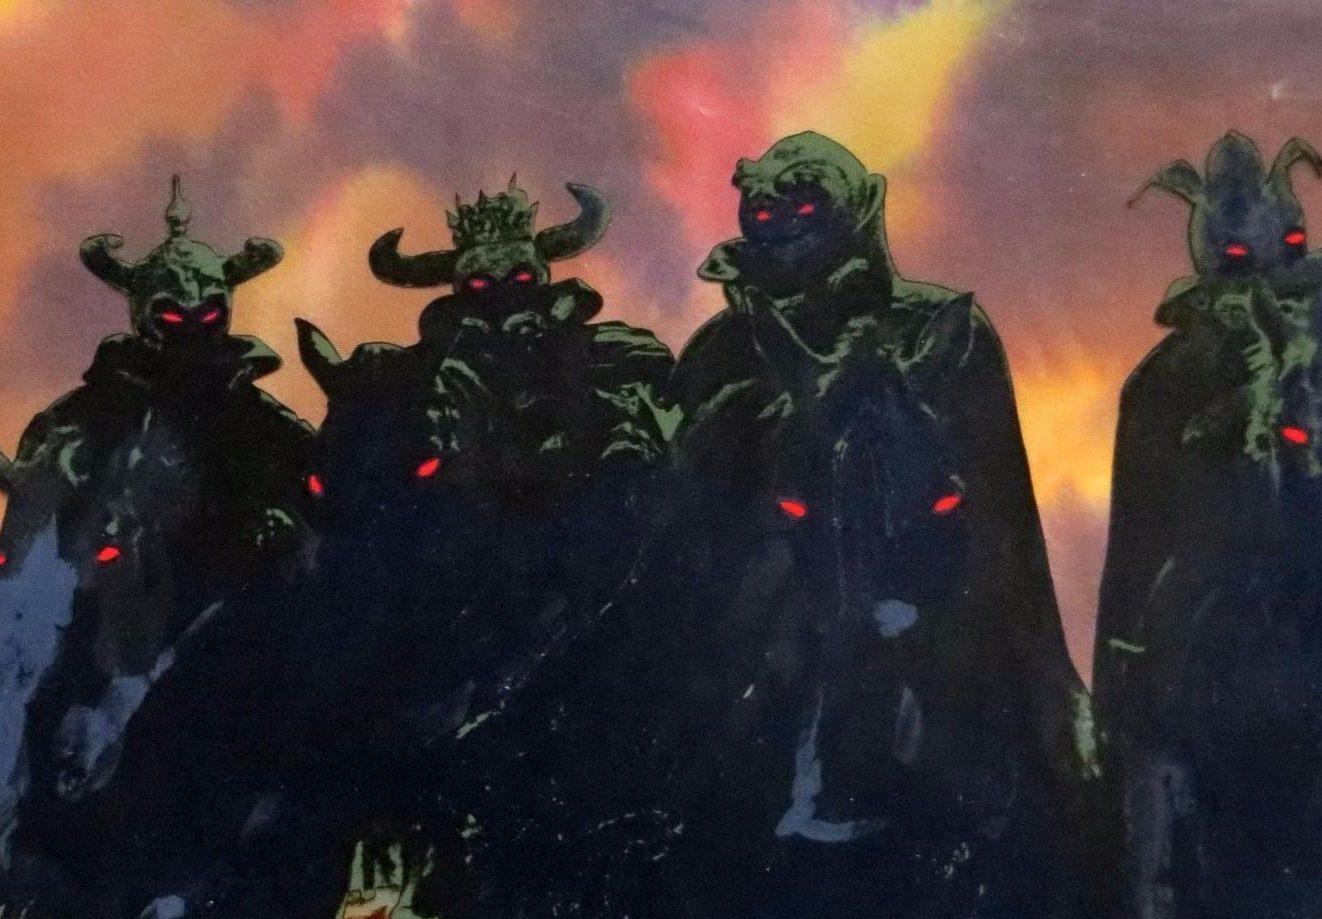 lord rings art original ralph bakshi 1 b875b23f4b4b493523277a69eaacbf10 e1629896055816 The Black Cauldron: 20 Facts About Disney's Biggest Box Office Bomb